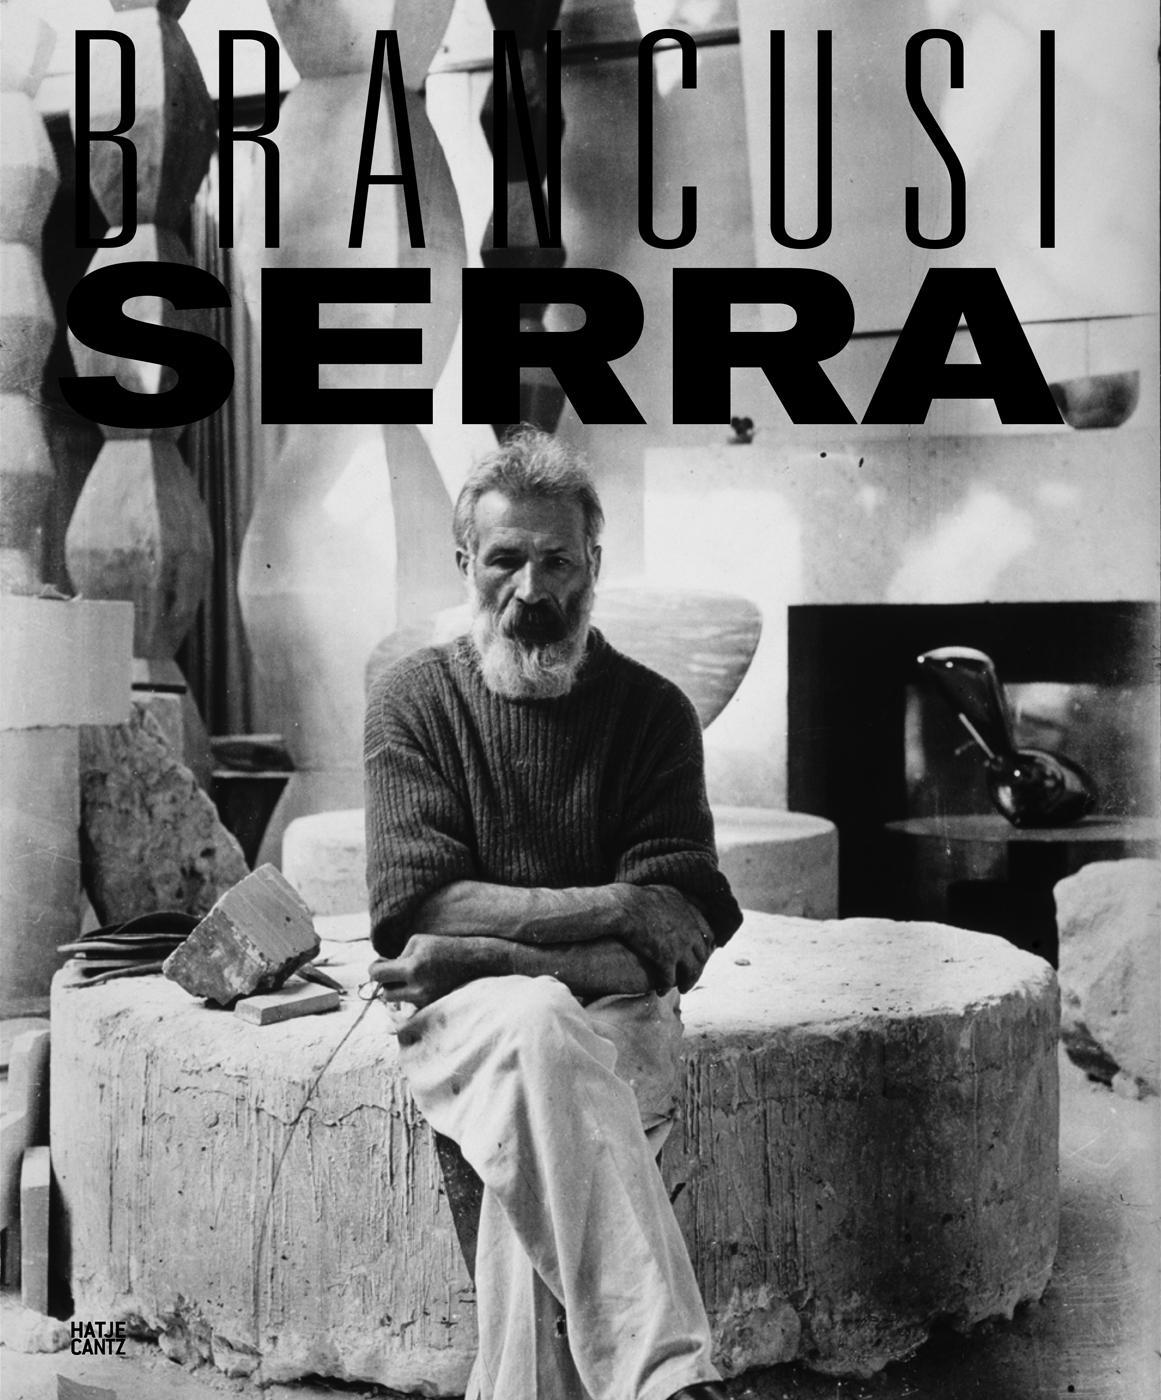 Brancusi Serra.jpg